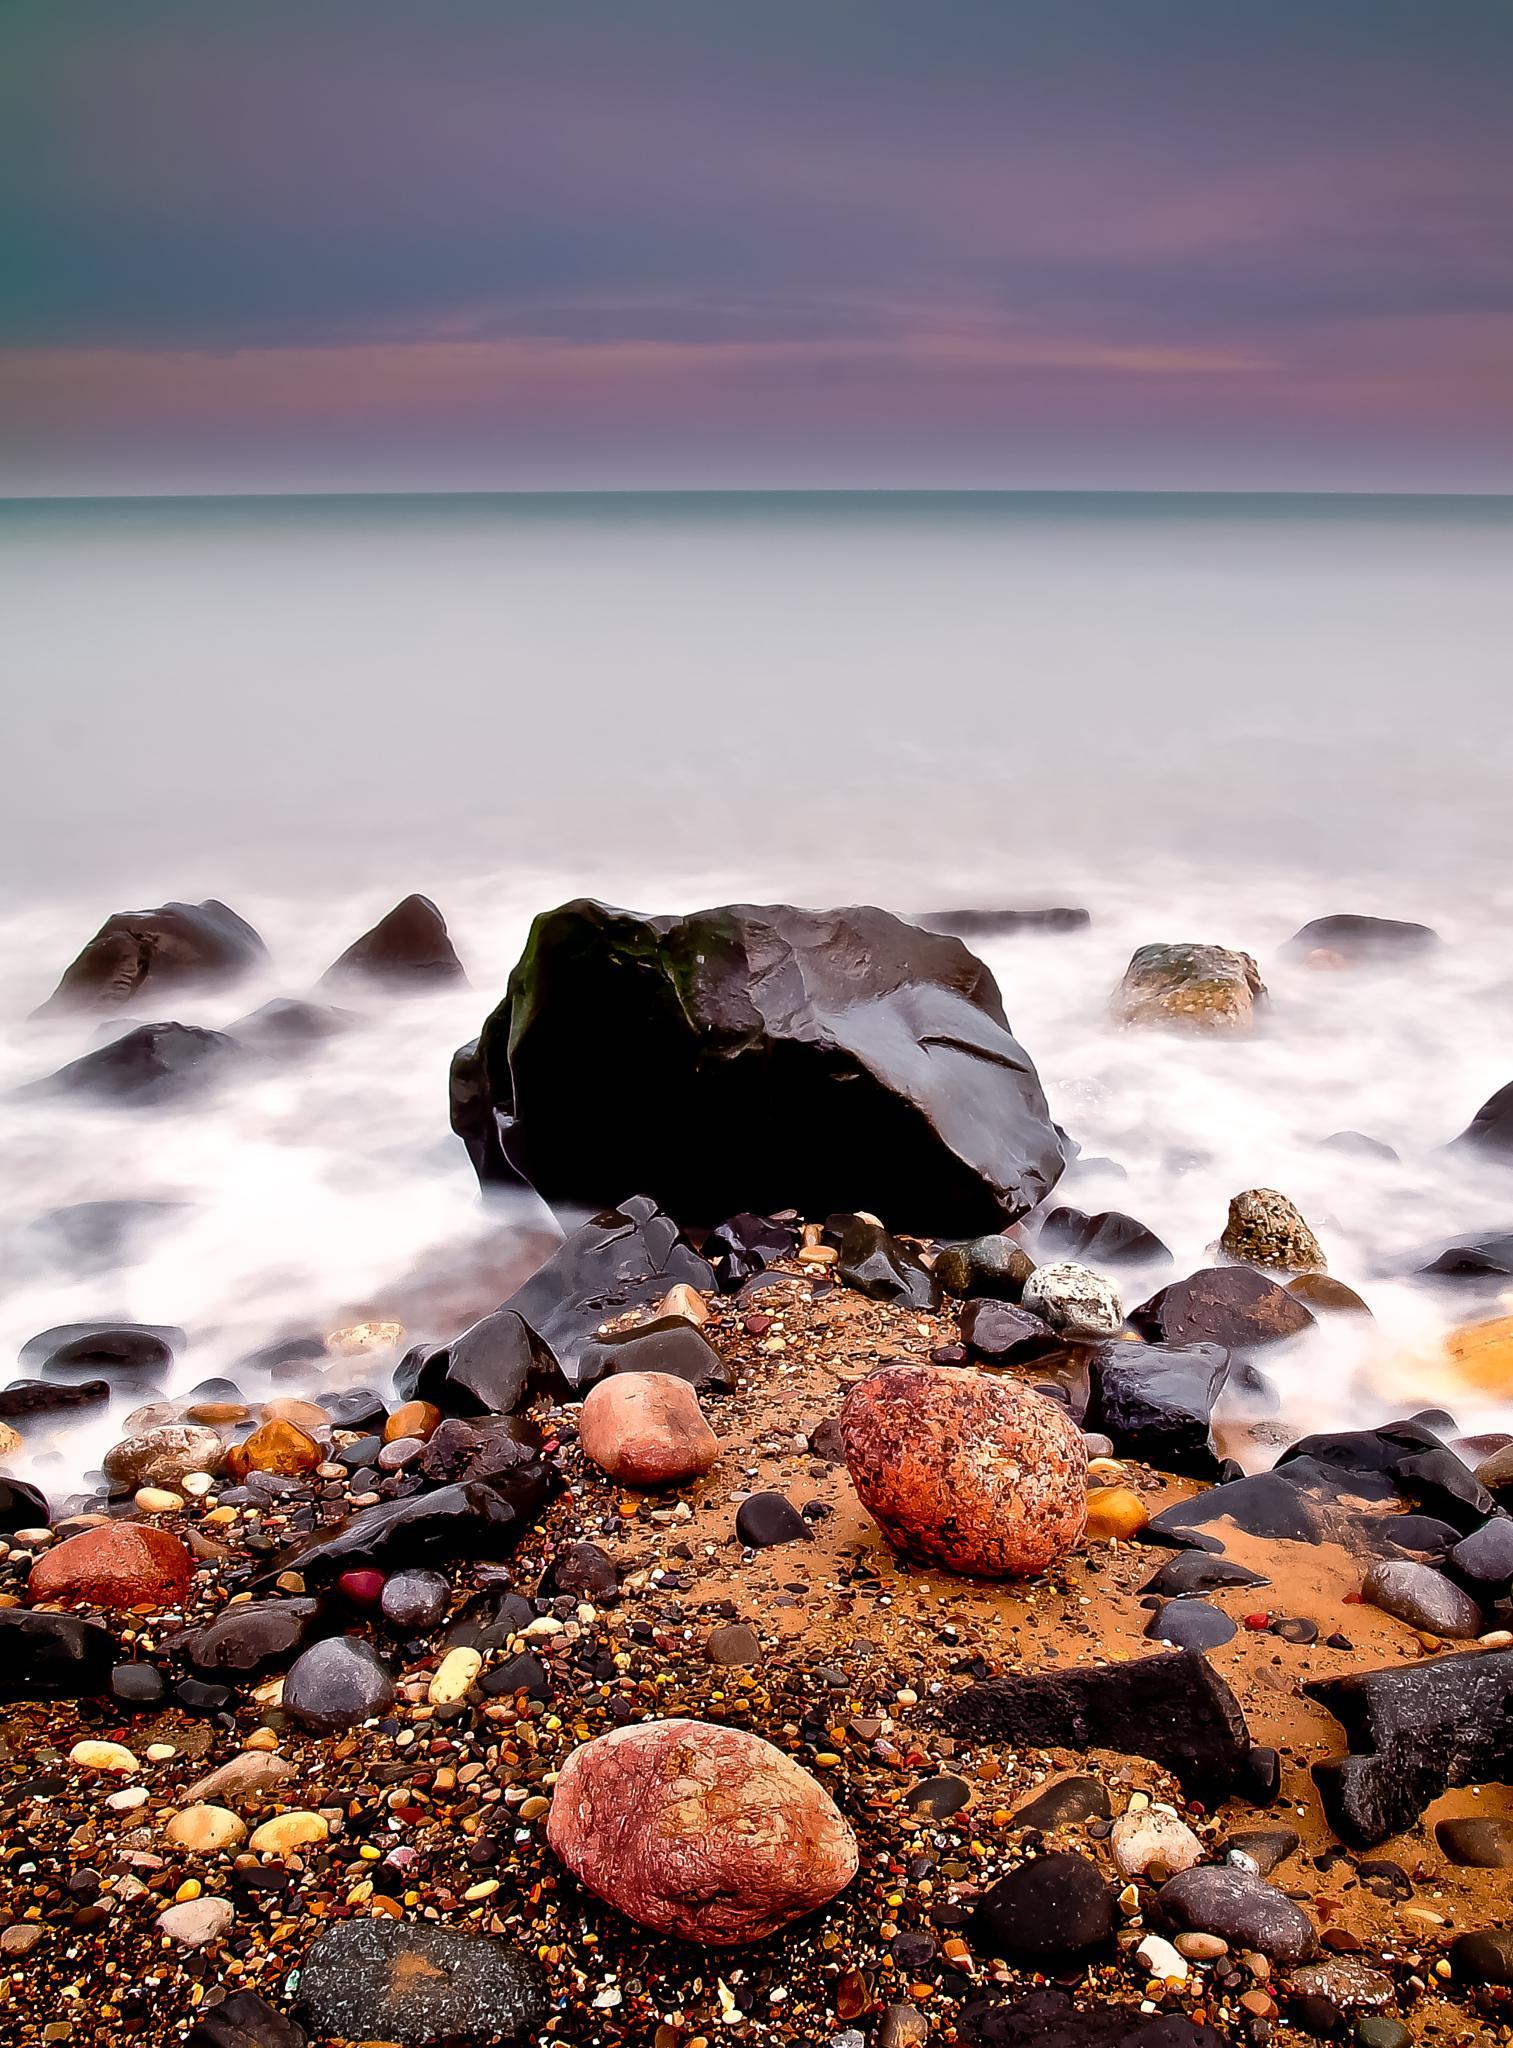 Boulders by Peter Edwardo Vicente.